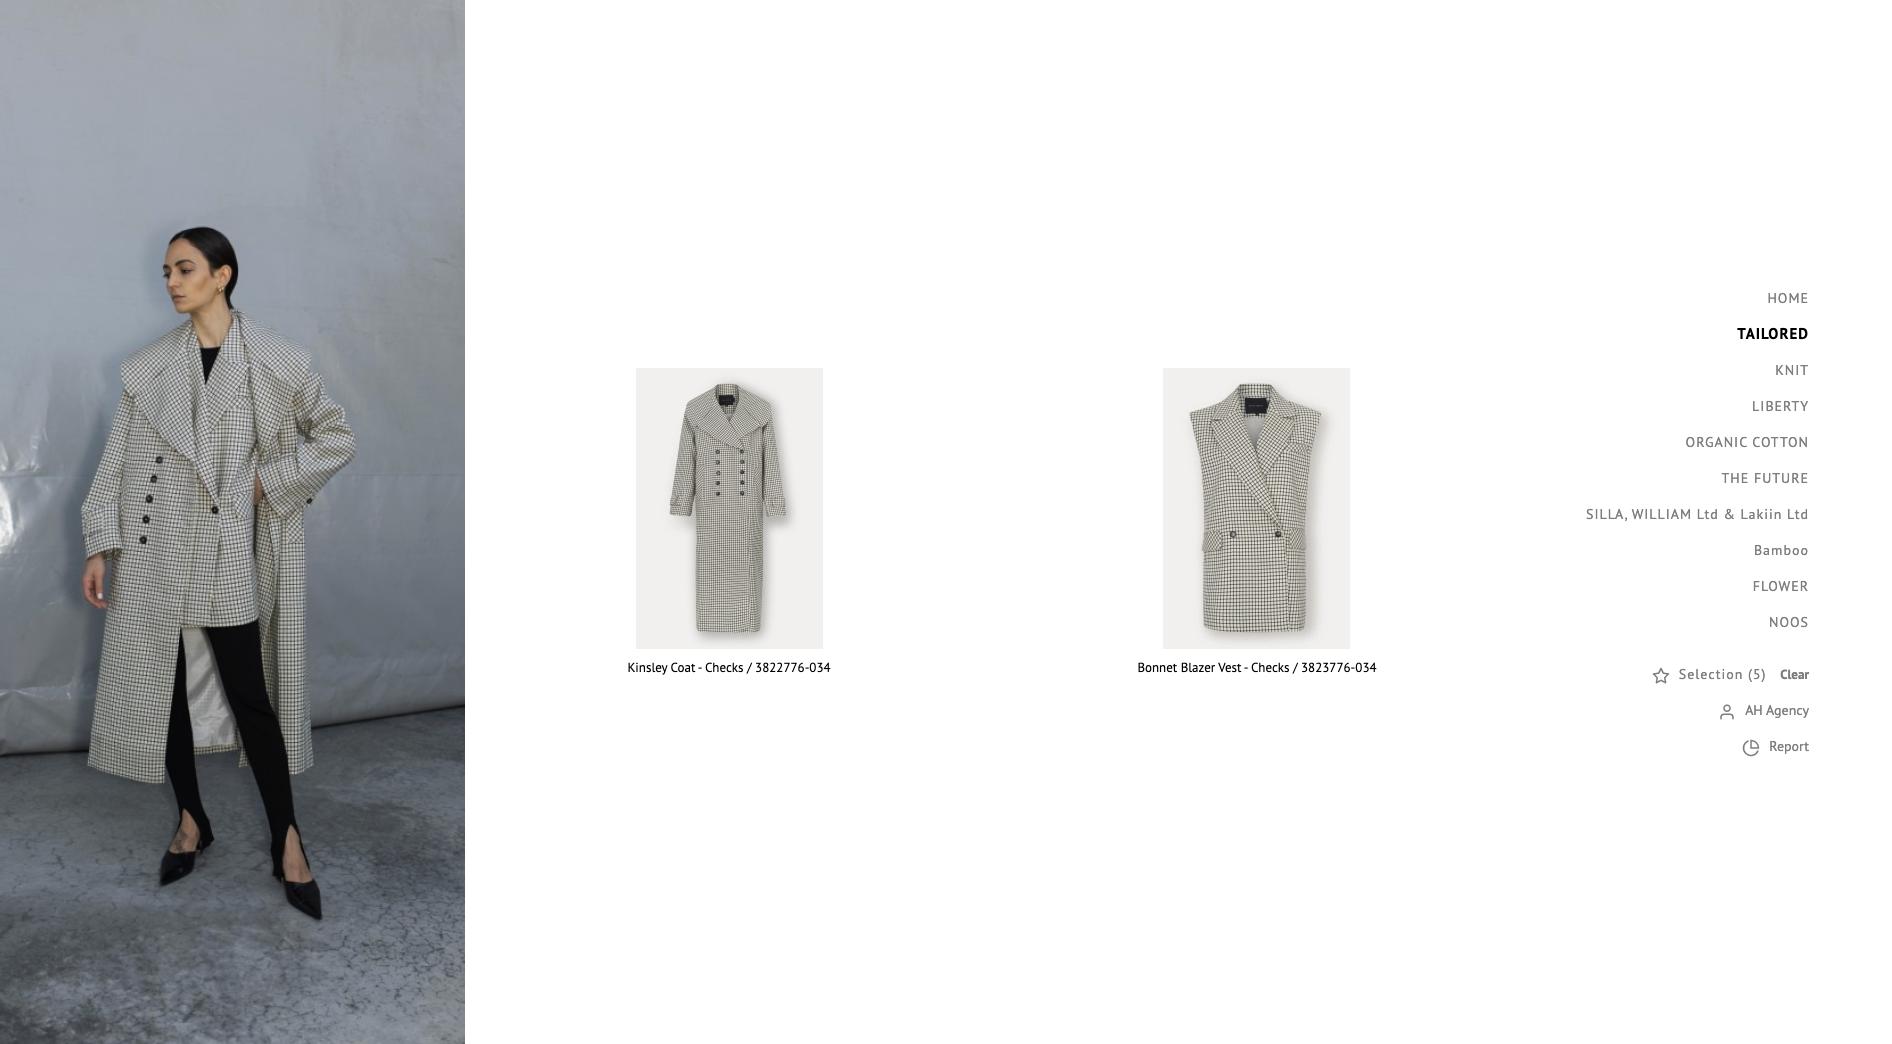 Birgitte Herskind use traede virtual showroom showcasing shirt